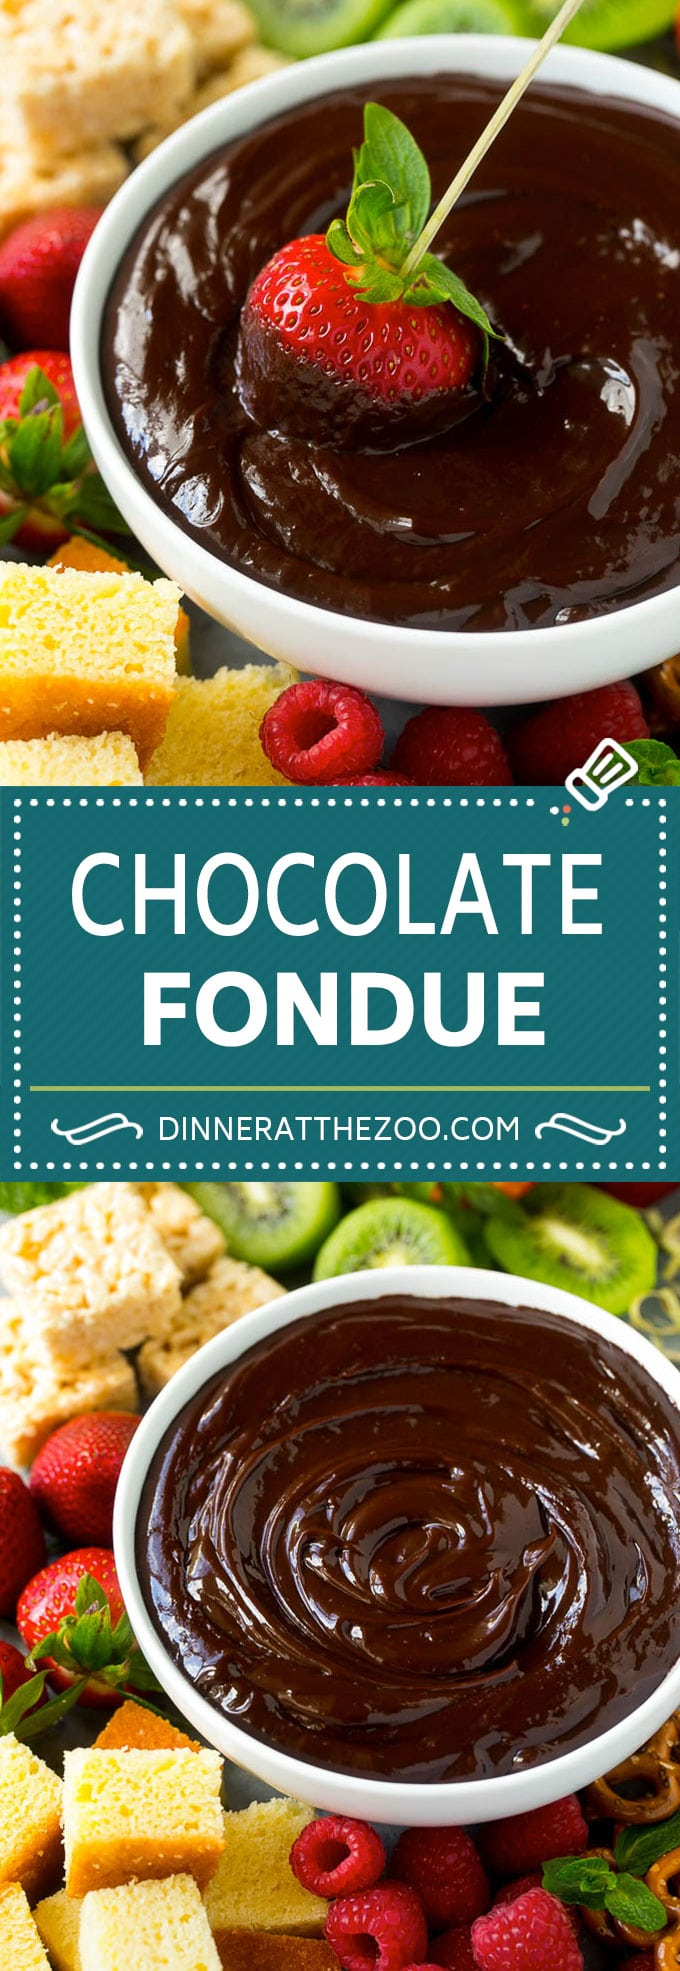 Chocolate Fondue Recipe | Chocolate Sauce | Chocolate Dip #chocolate #dessert #glutenfree #fondue #dinneratthezoo